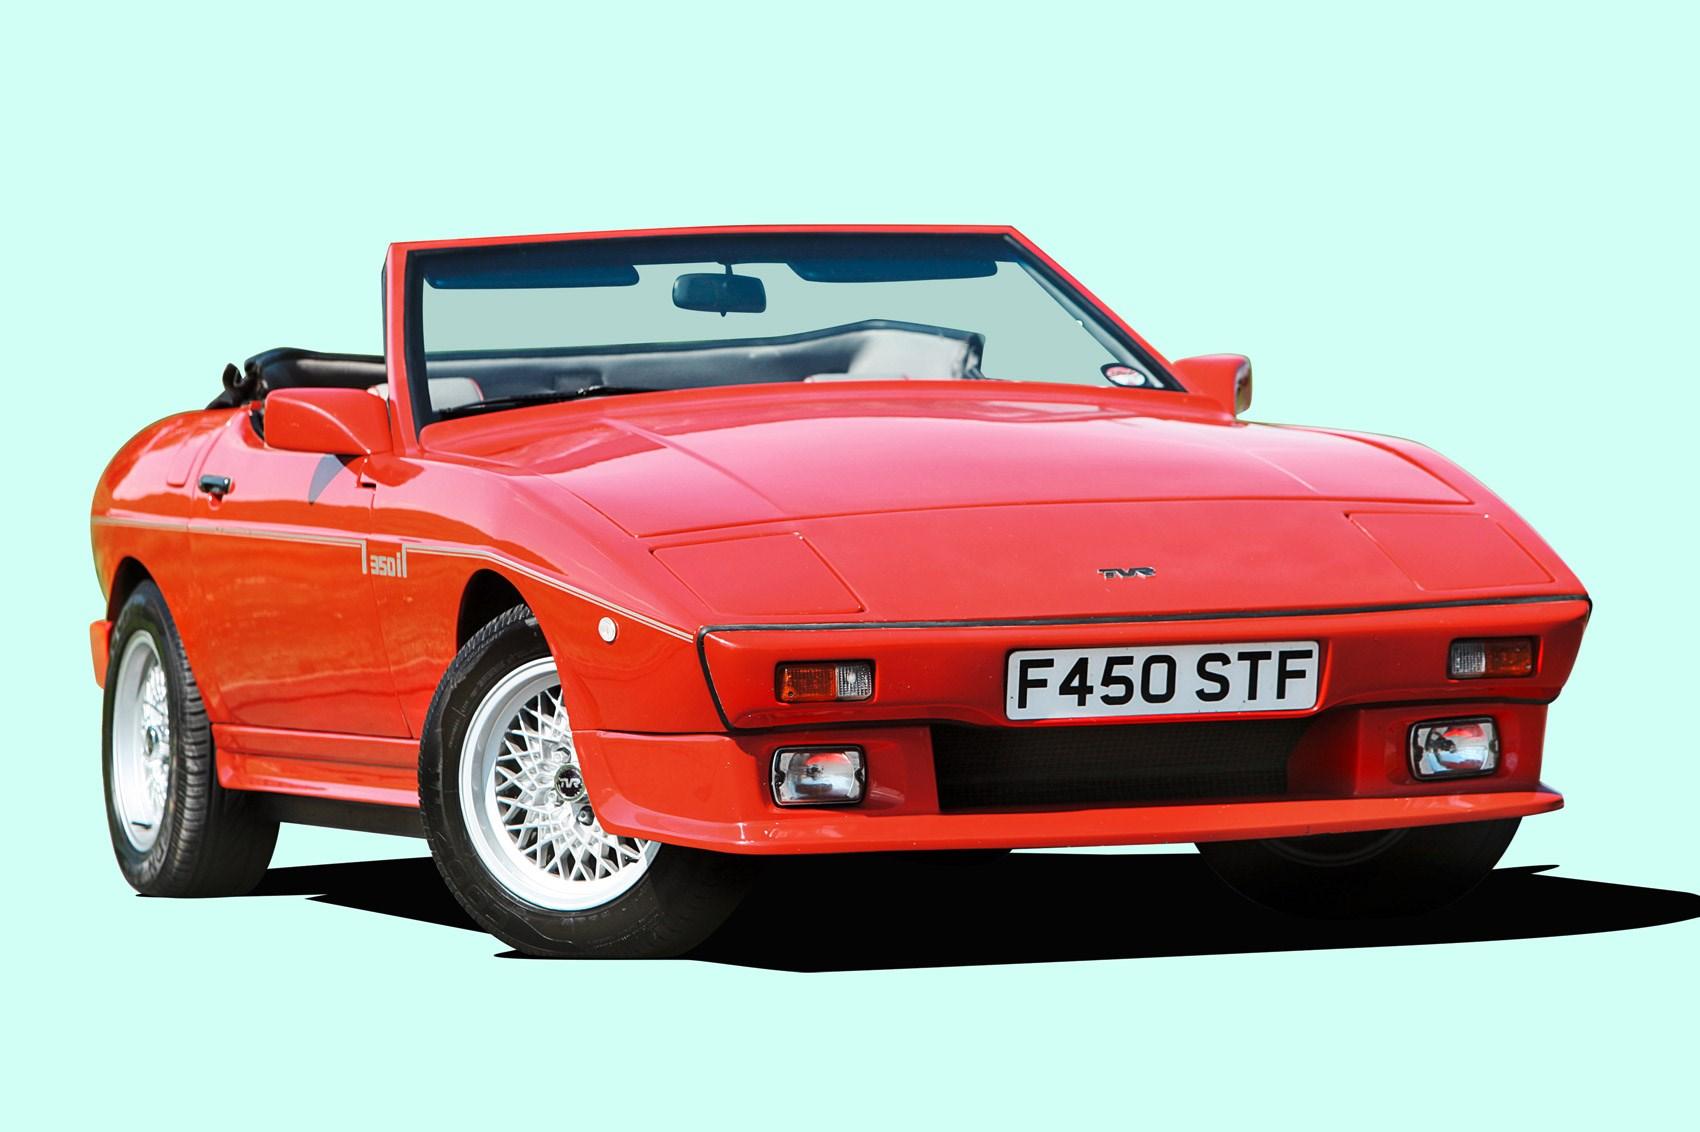 tvr01 Inspiring Tvr Griffith Wheel Nut torque Cars Trend